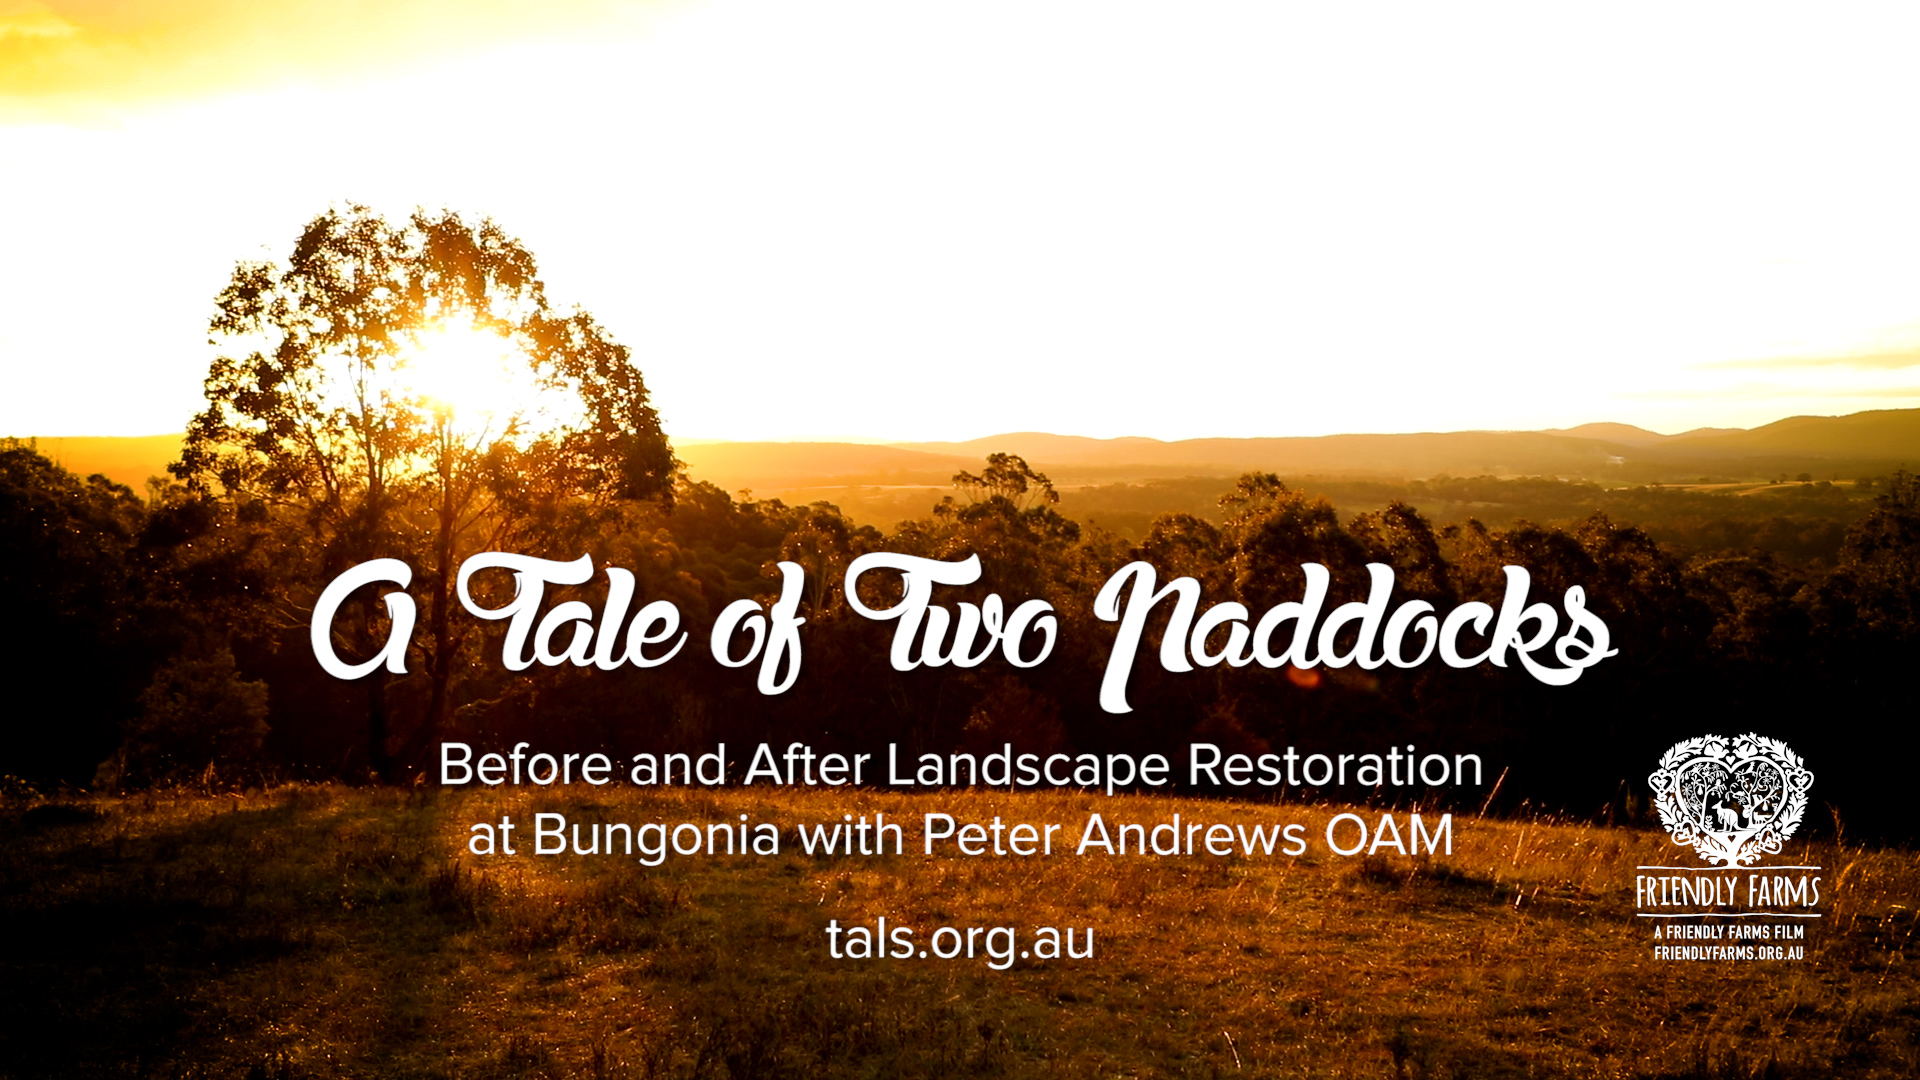 A Tale of Two Paddocks